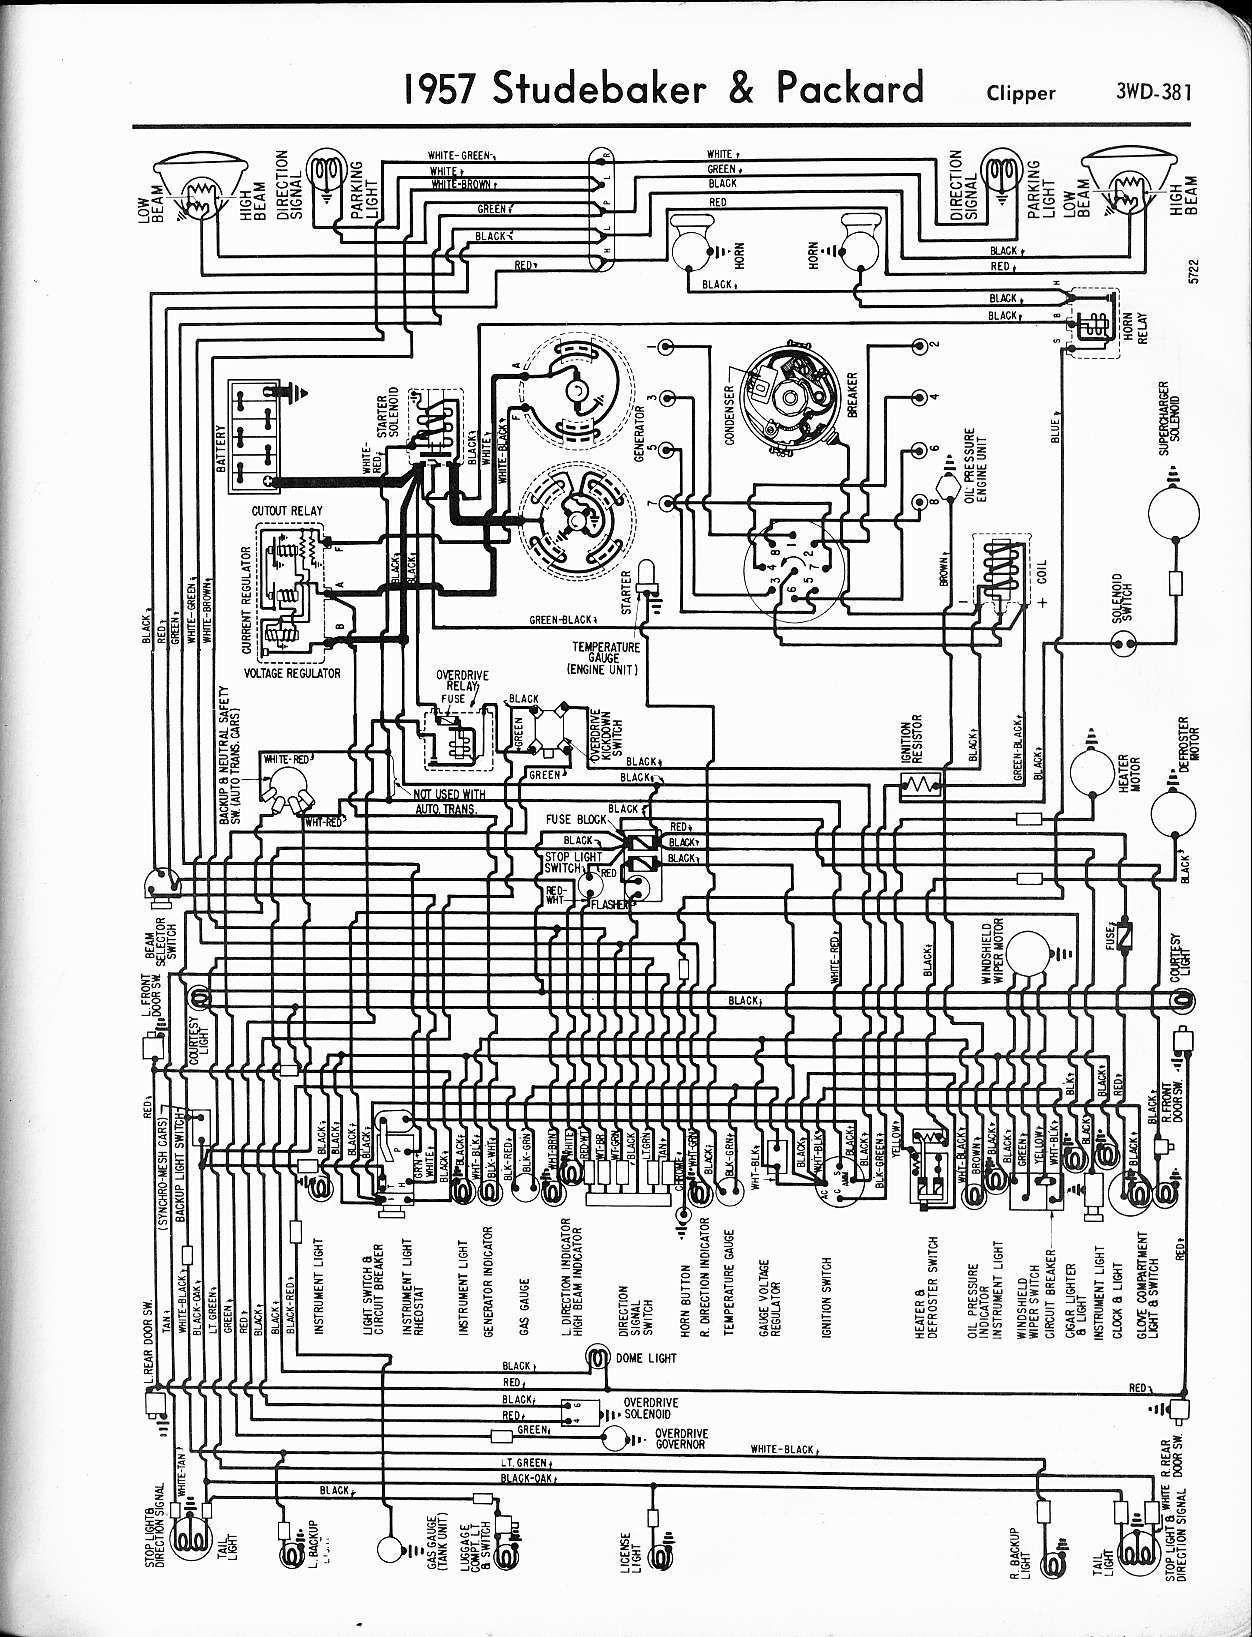 Wiring Diagram Cars Trucks Wiring Diagram Cars Trucks Truck Horn Wiring Wiring Diagrams Circuit Diagram Electrical Wiring Diagram Electrical Diagram